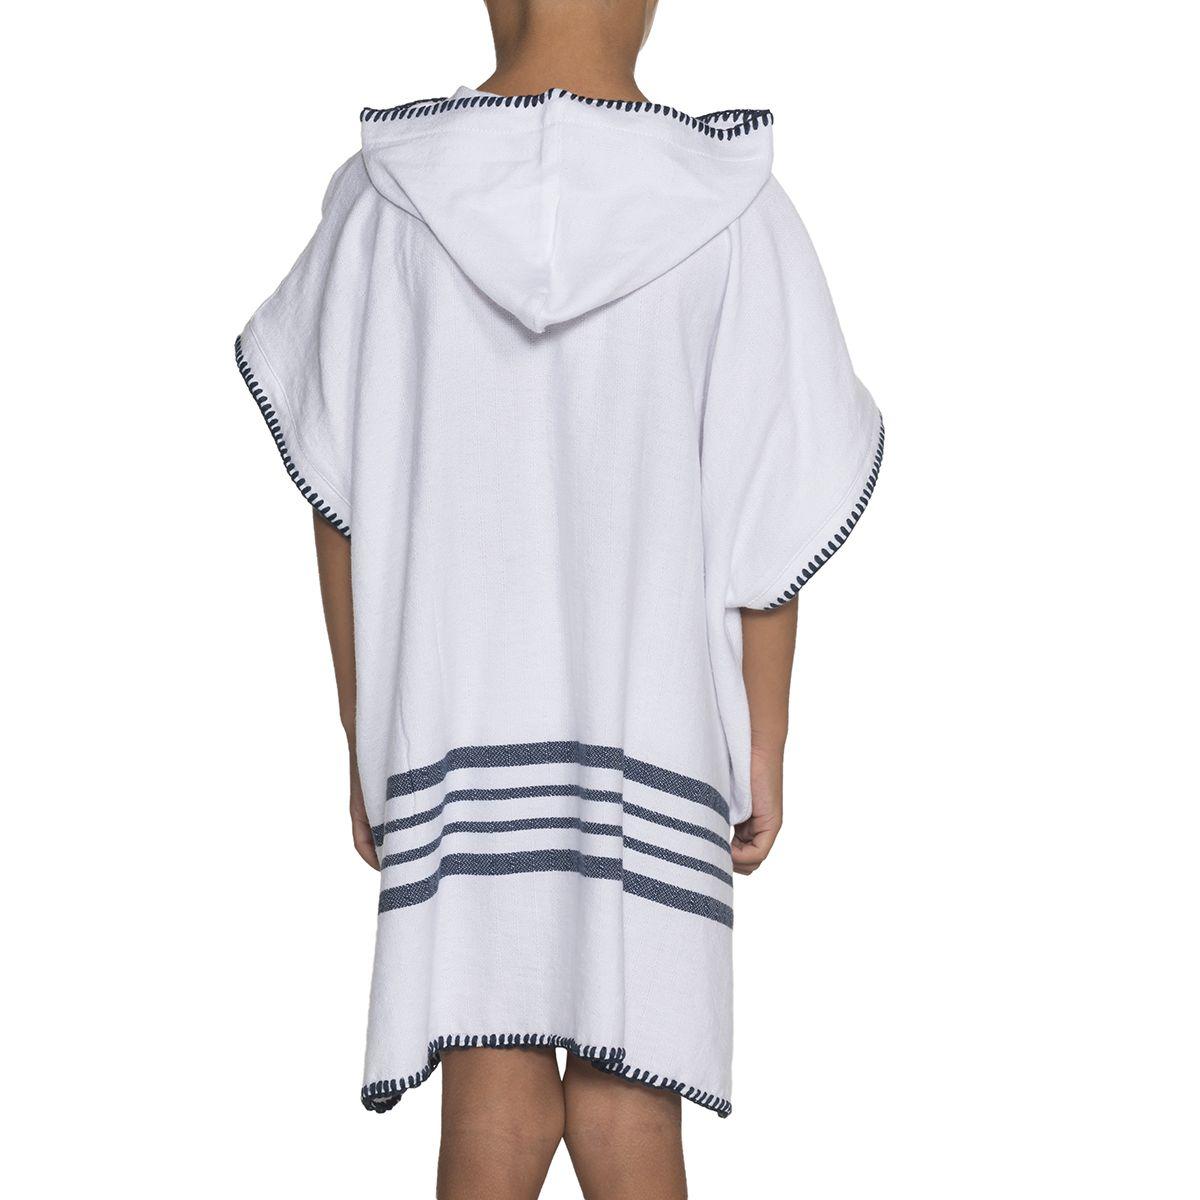 Poncho Kiddo / White Sultan - Navy Stripes